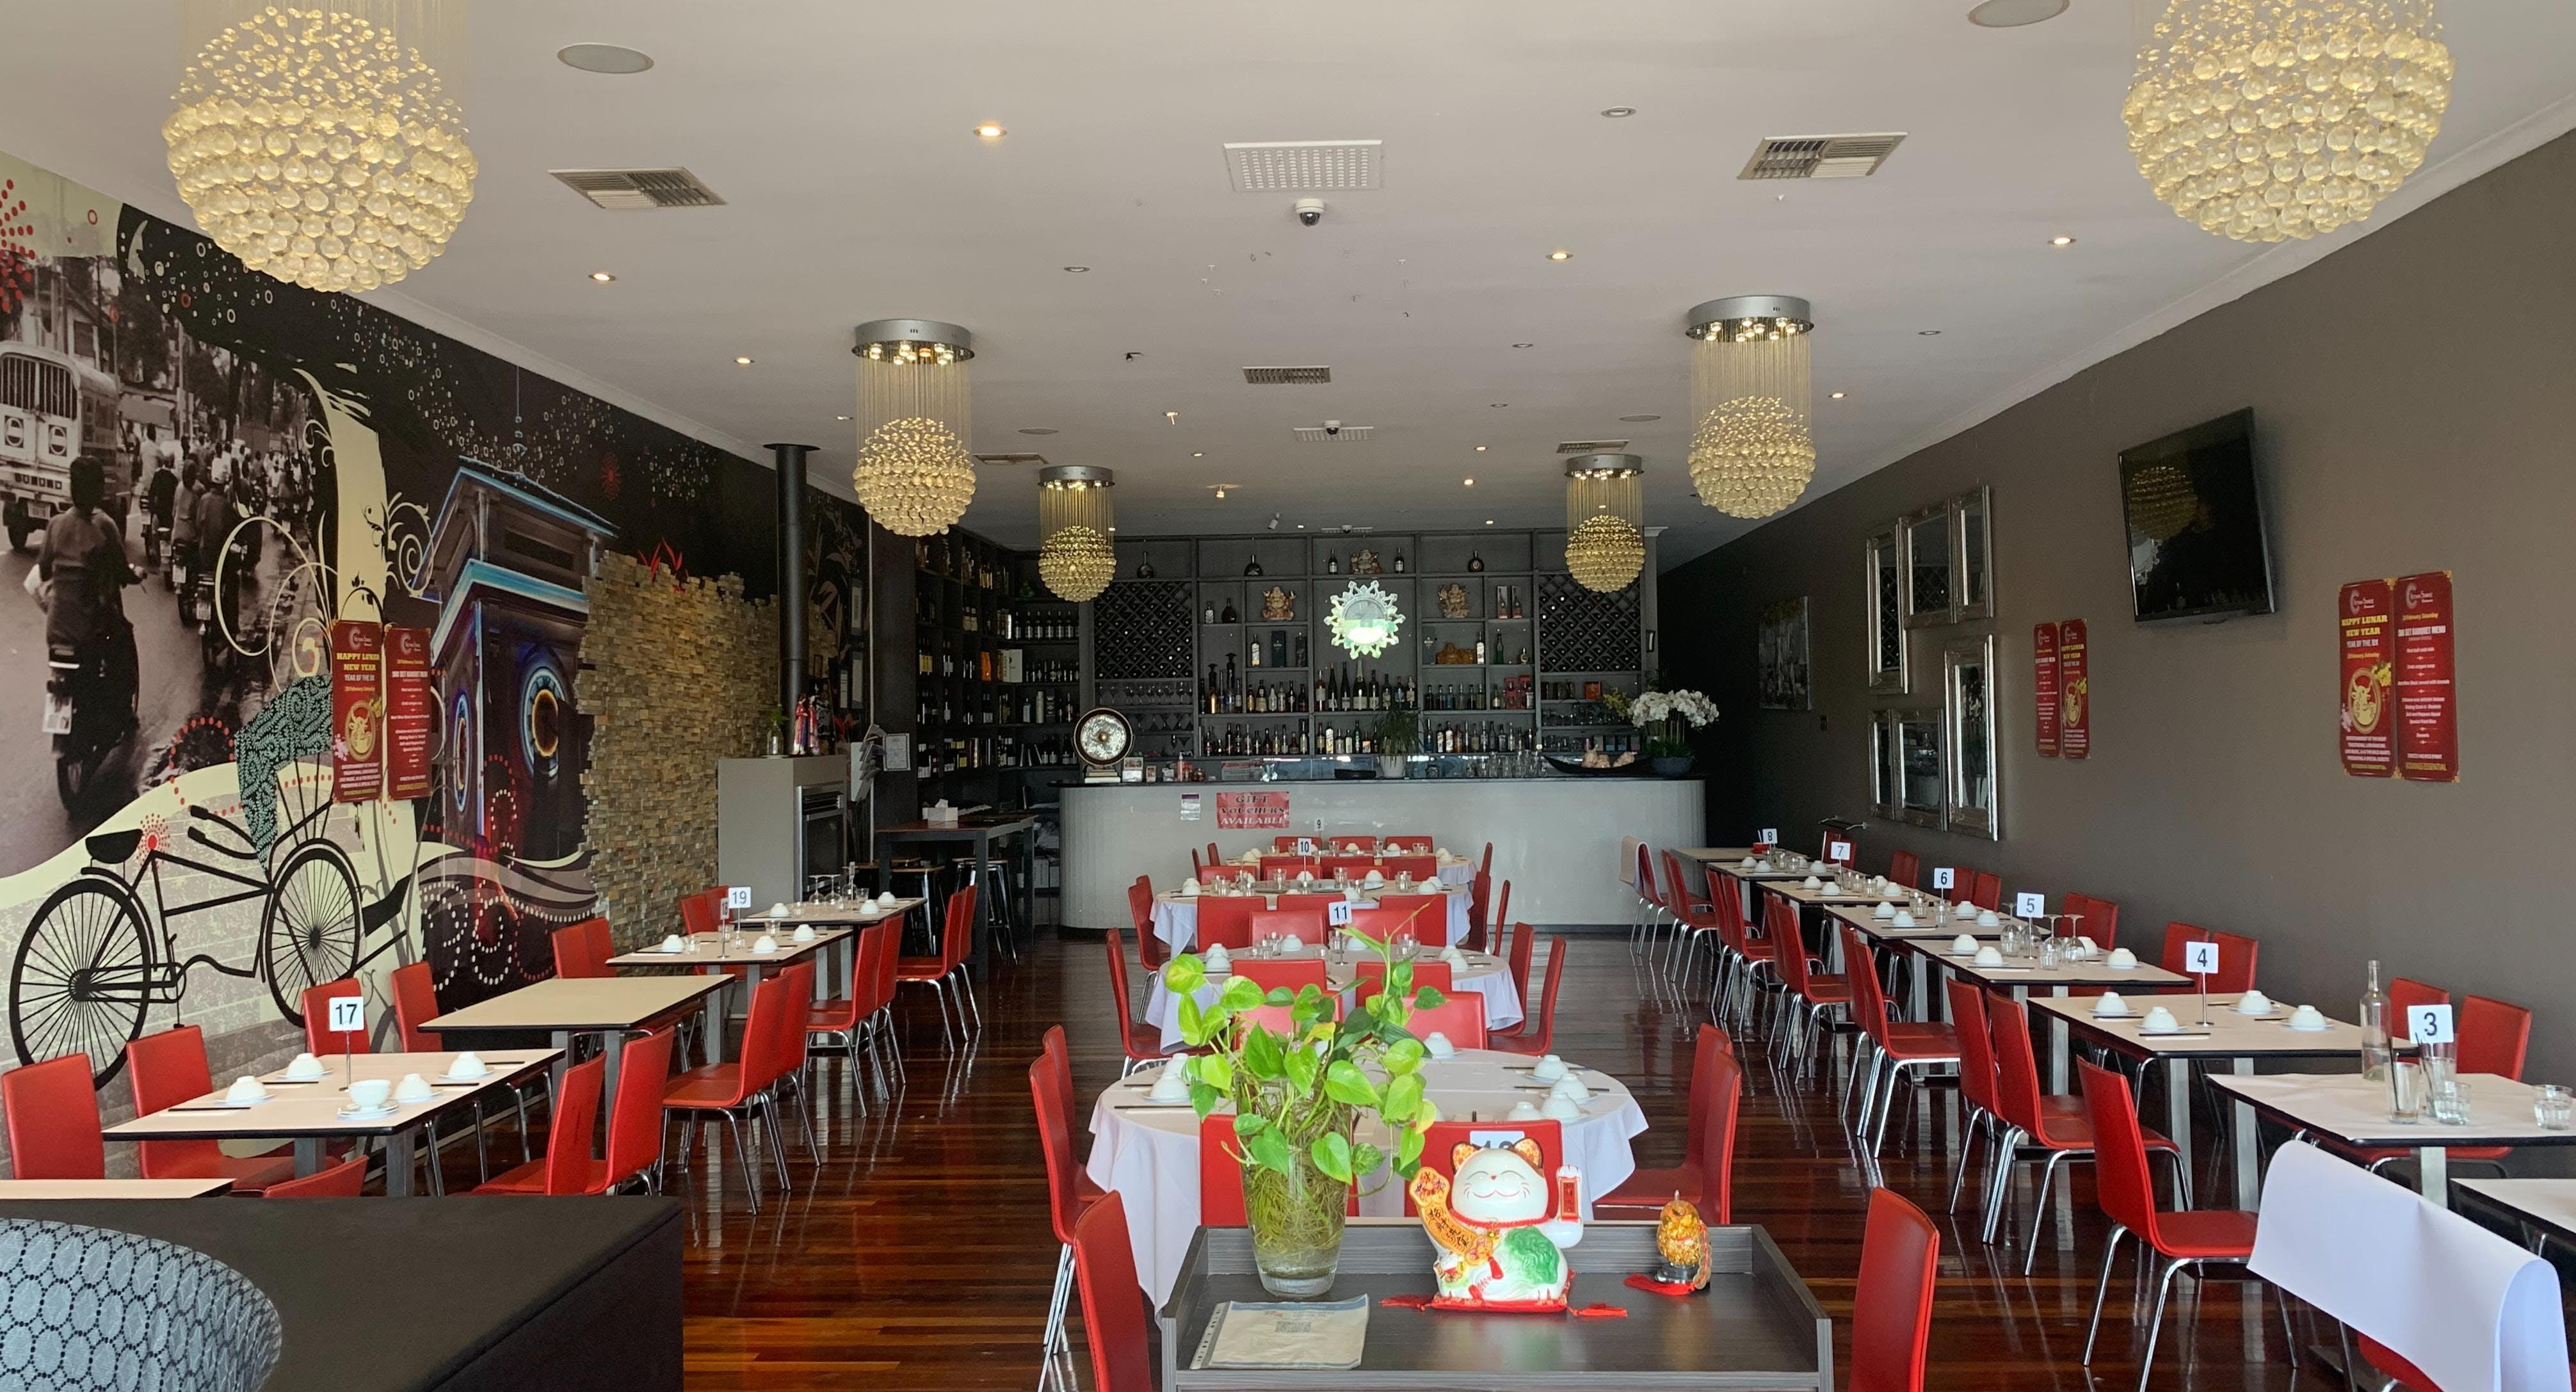 Photo of restaurant Vietnam Sunrise in lockleys, Adelaide